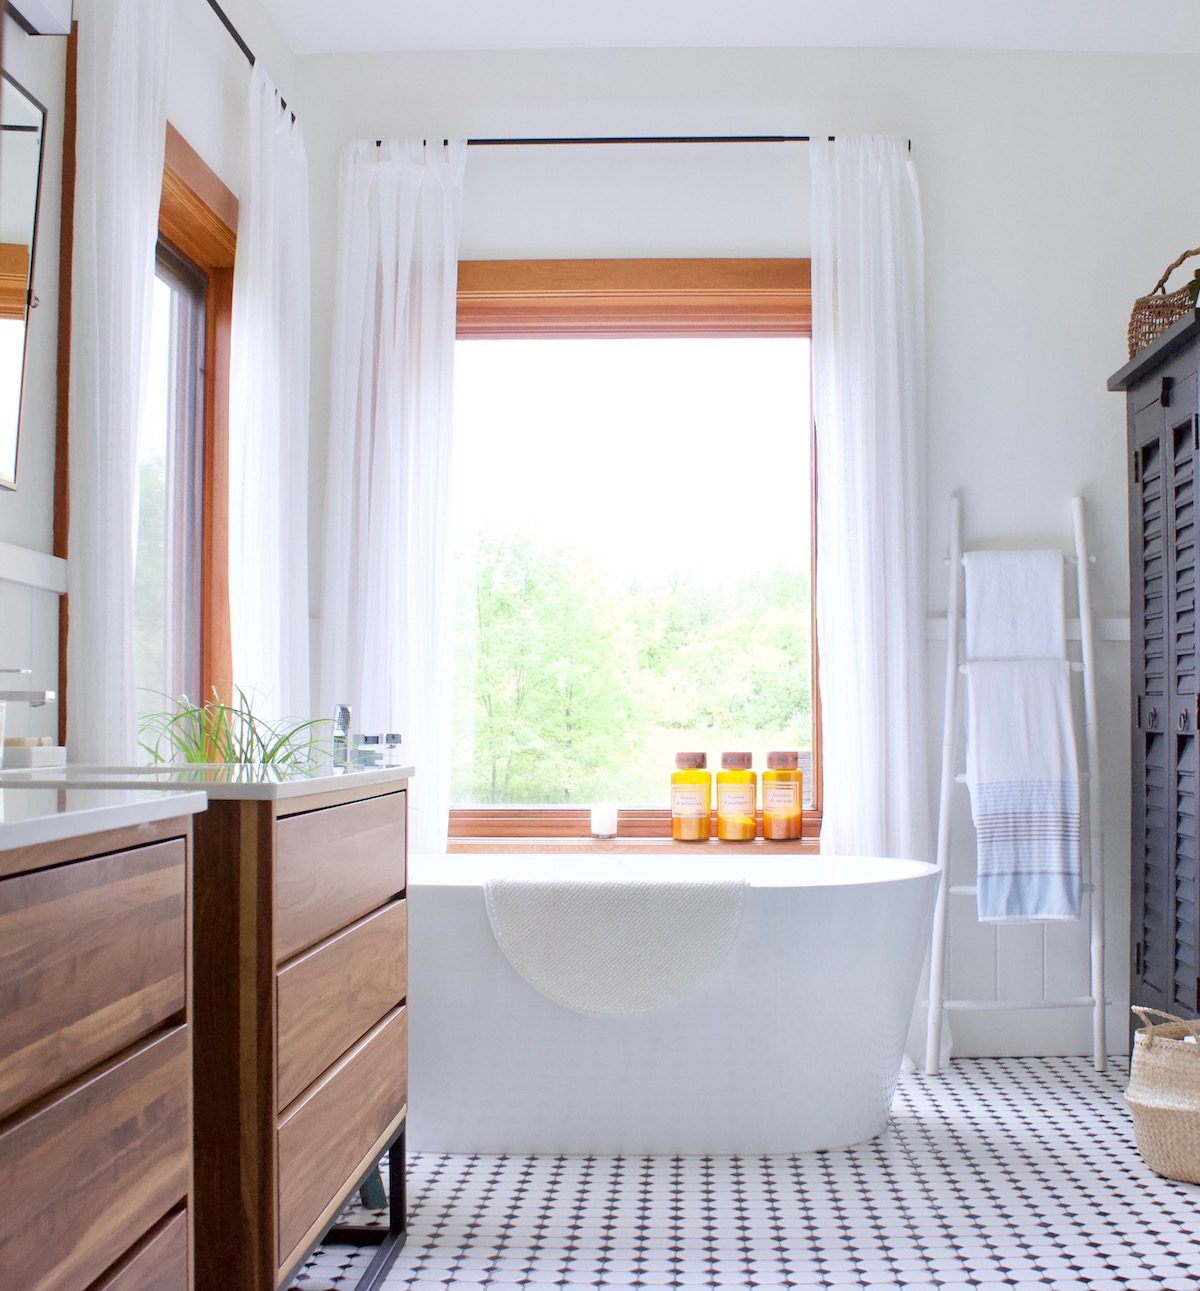 Bathroom Reno Design with Custom Details